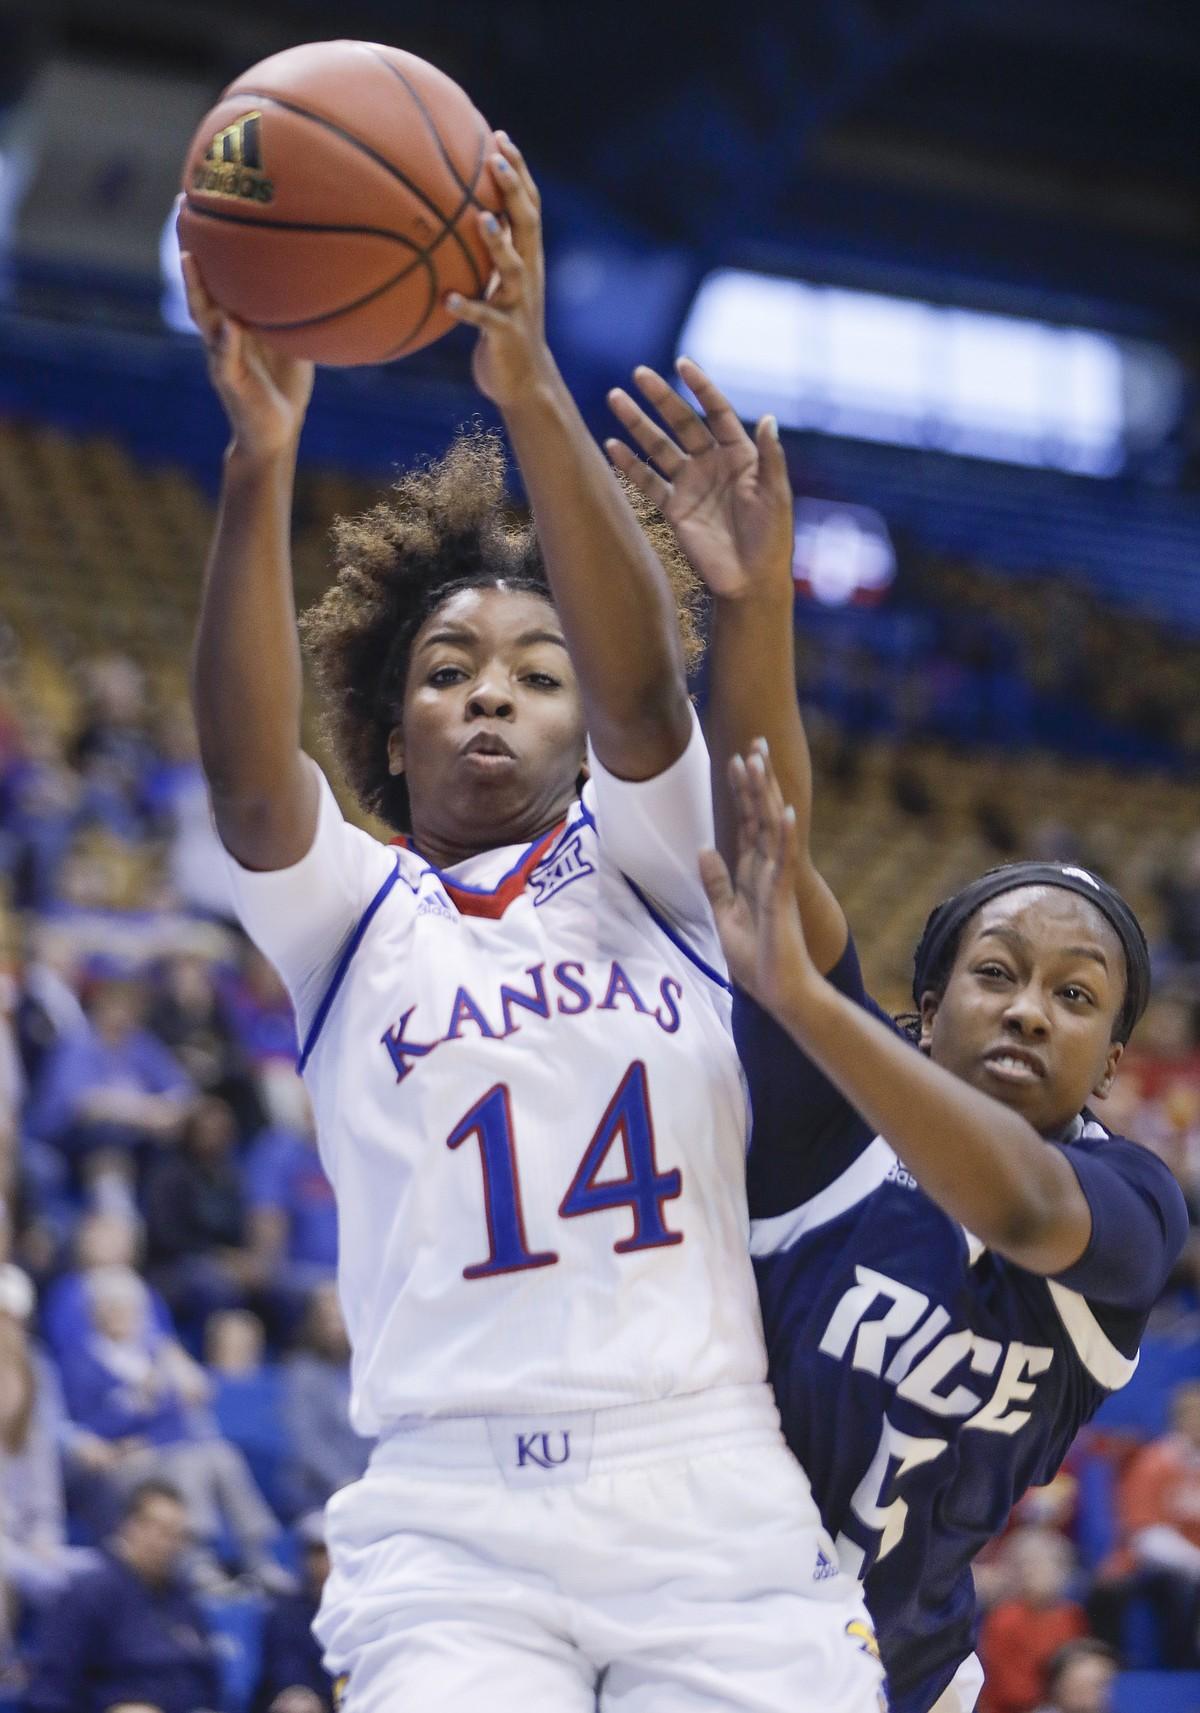 Kansas women's basketball vs. Rice | KUsports.com